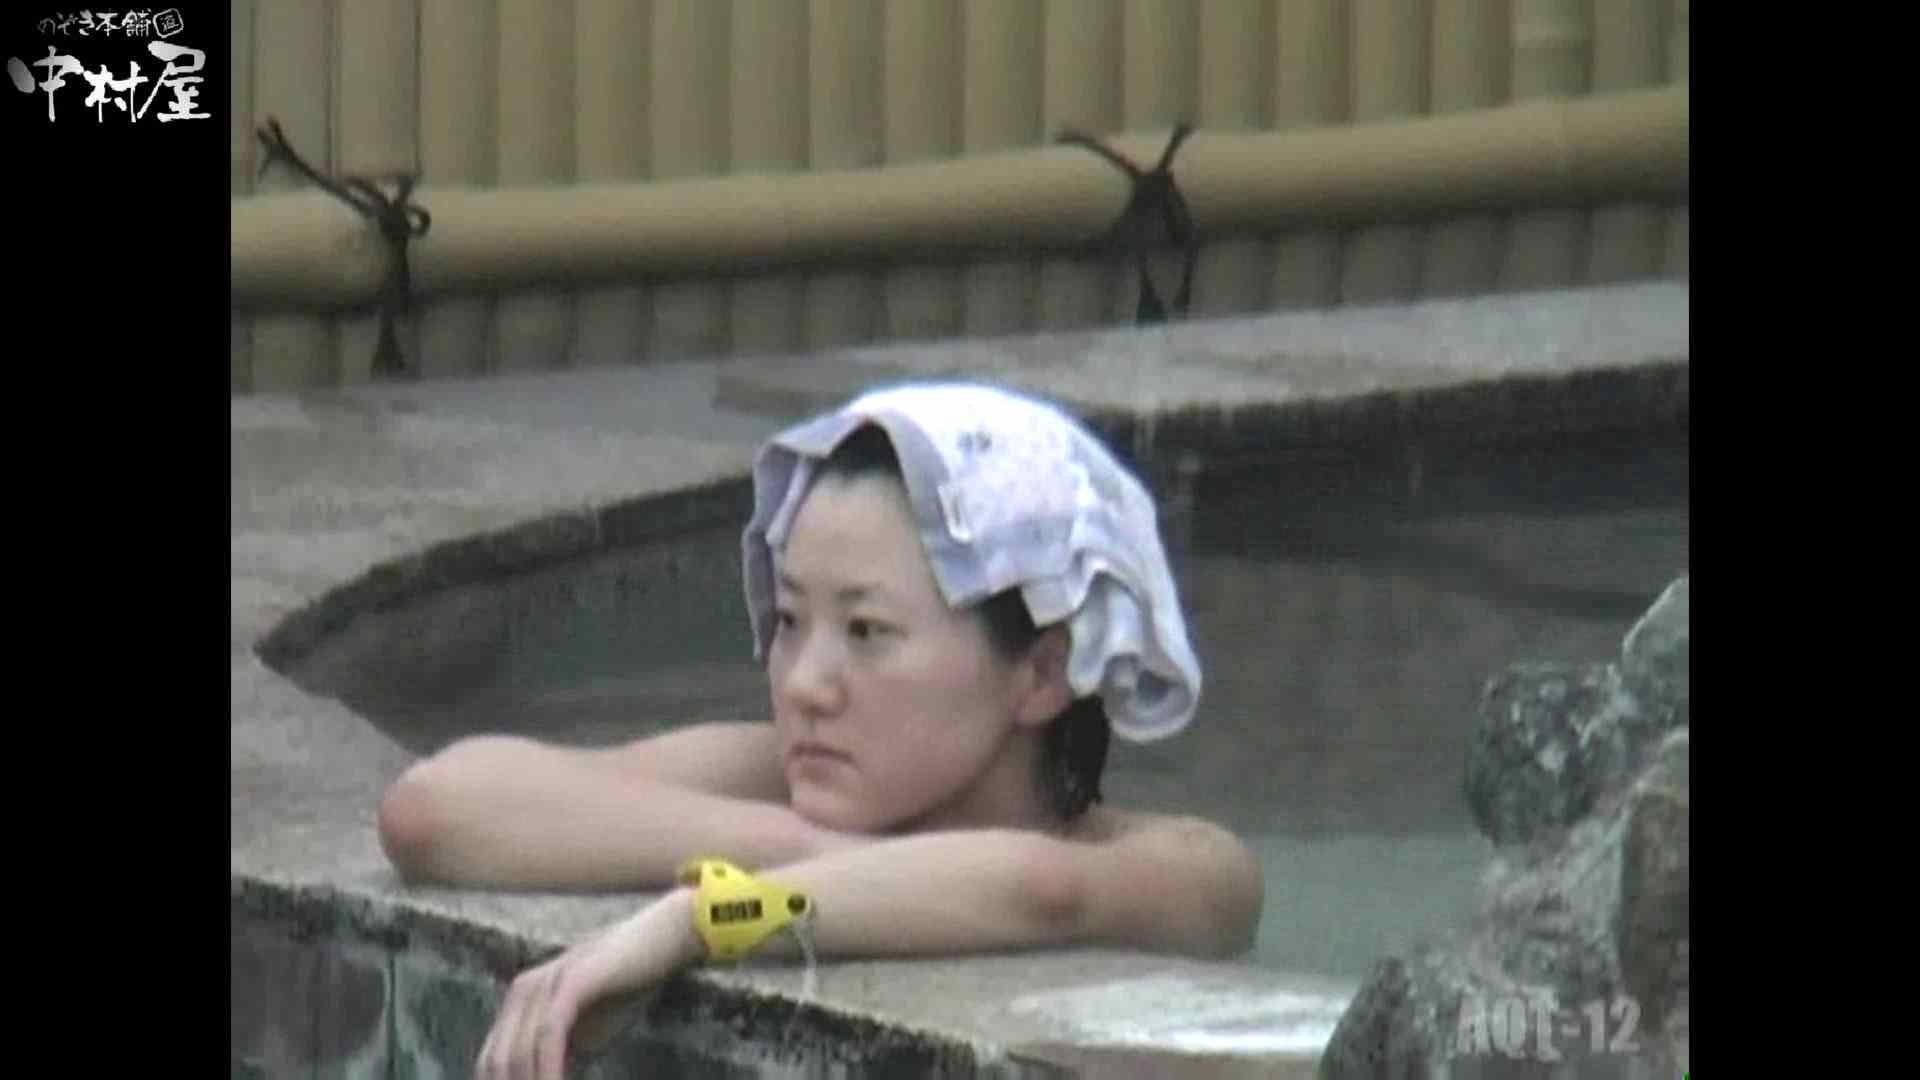 Aquaな露天風呂Vol.876潜入盗撮露天風呂十二判湯 其の三 OLエロ画像  75PICs 36